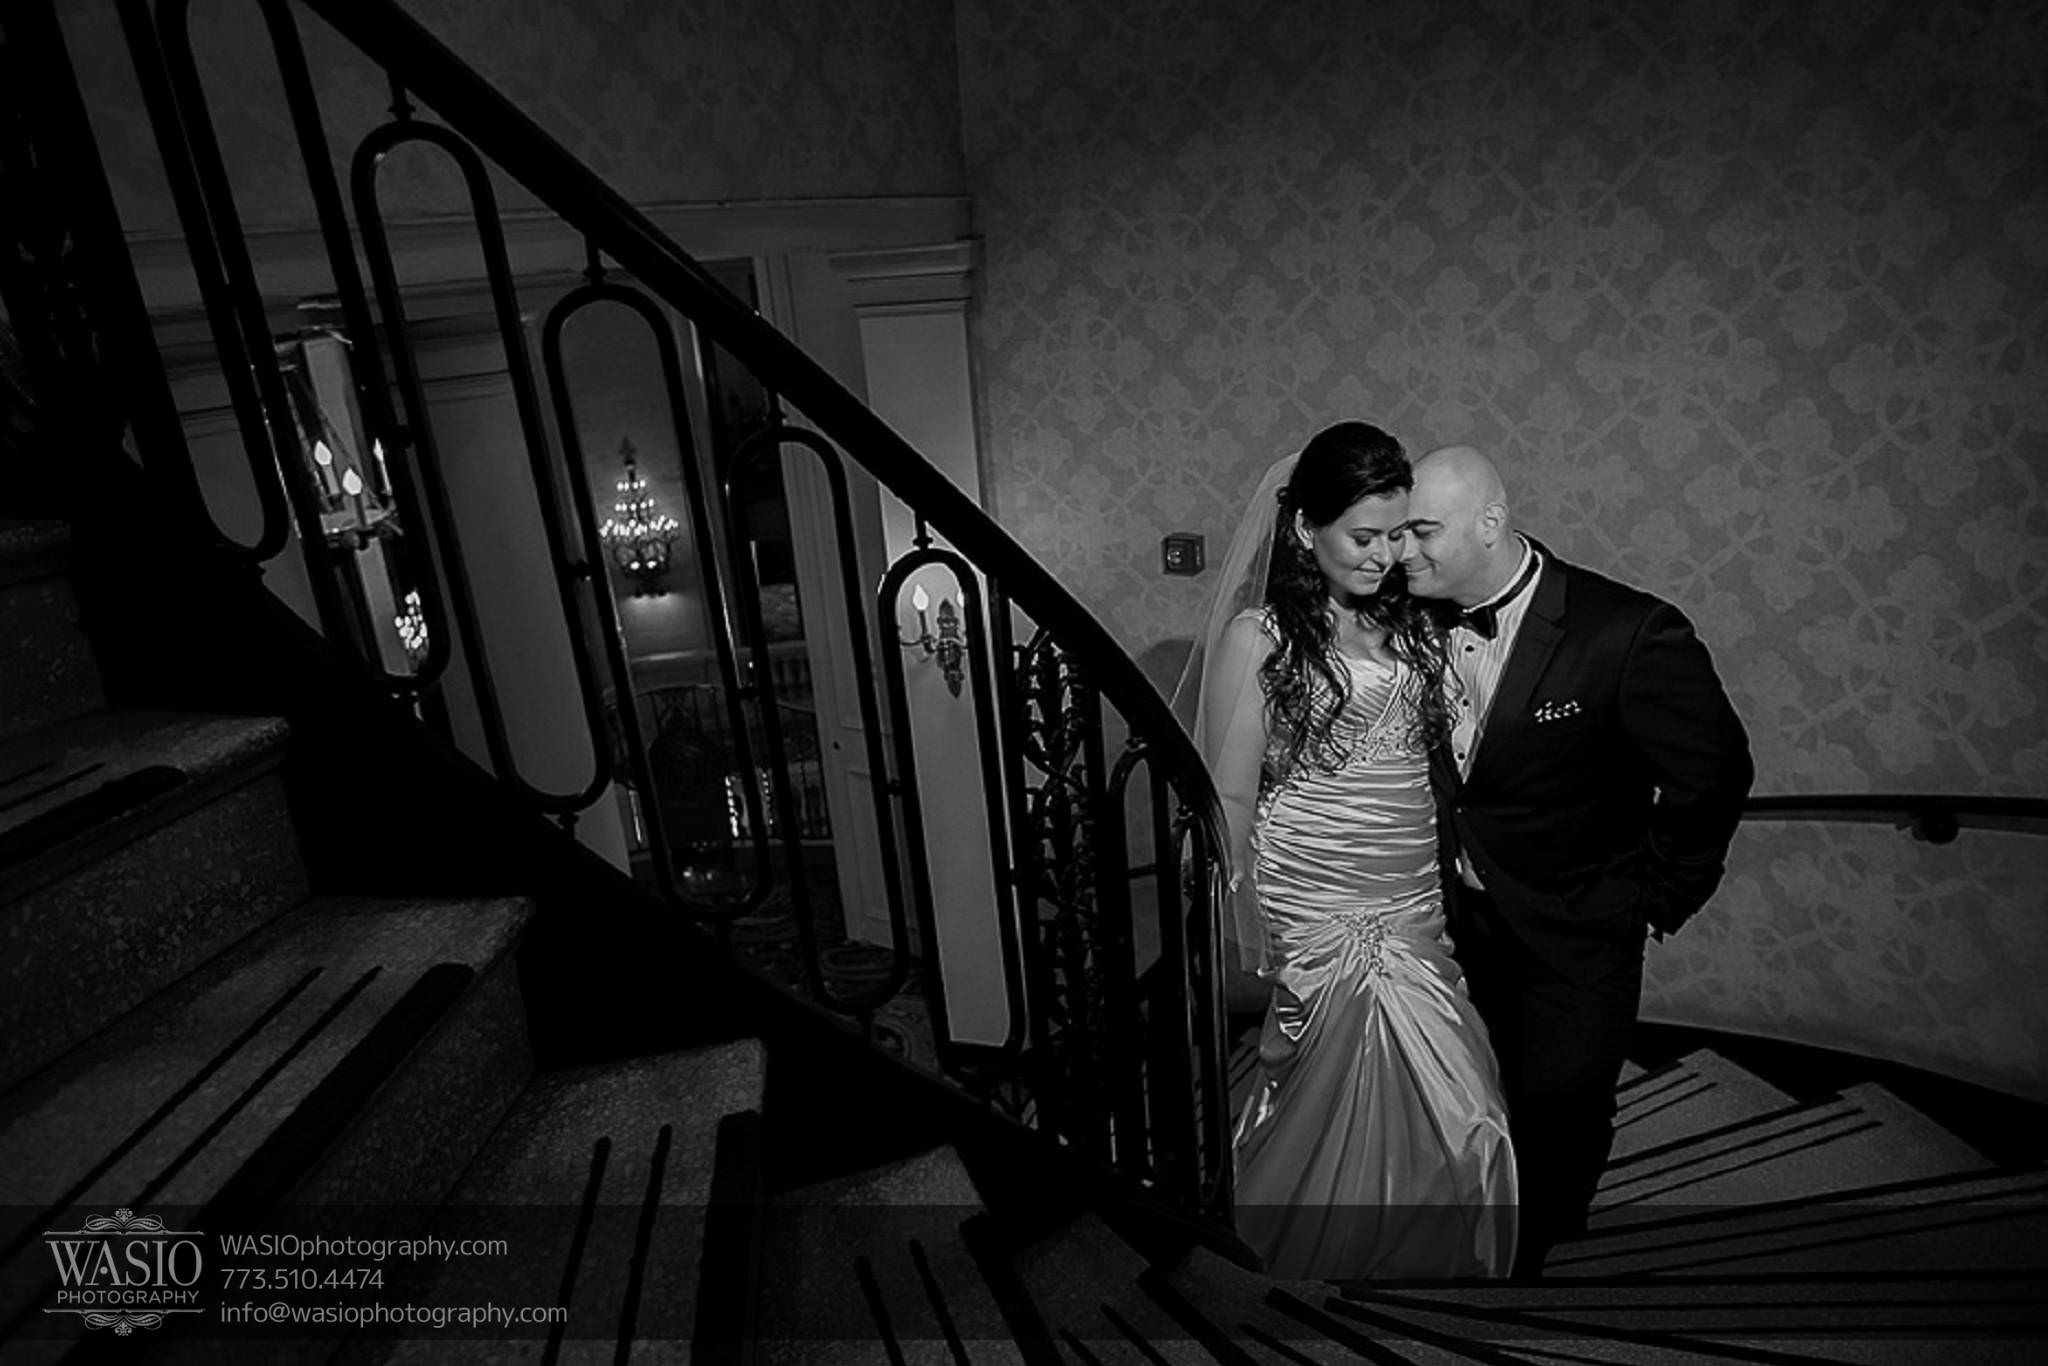 Chicago-wedding-photos-stairwell-black-white-053 Chicago Wedding Photos - Svetlana + Yuriy